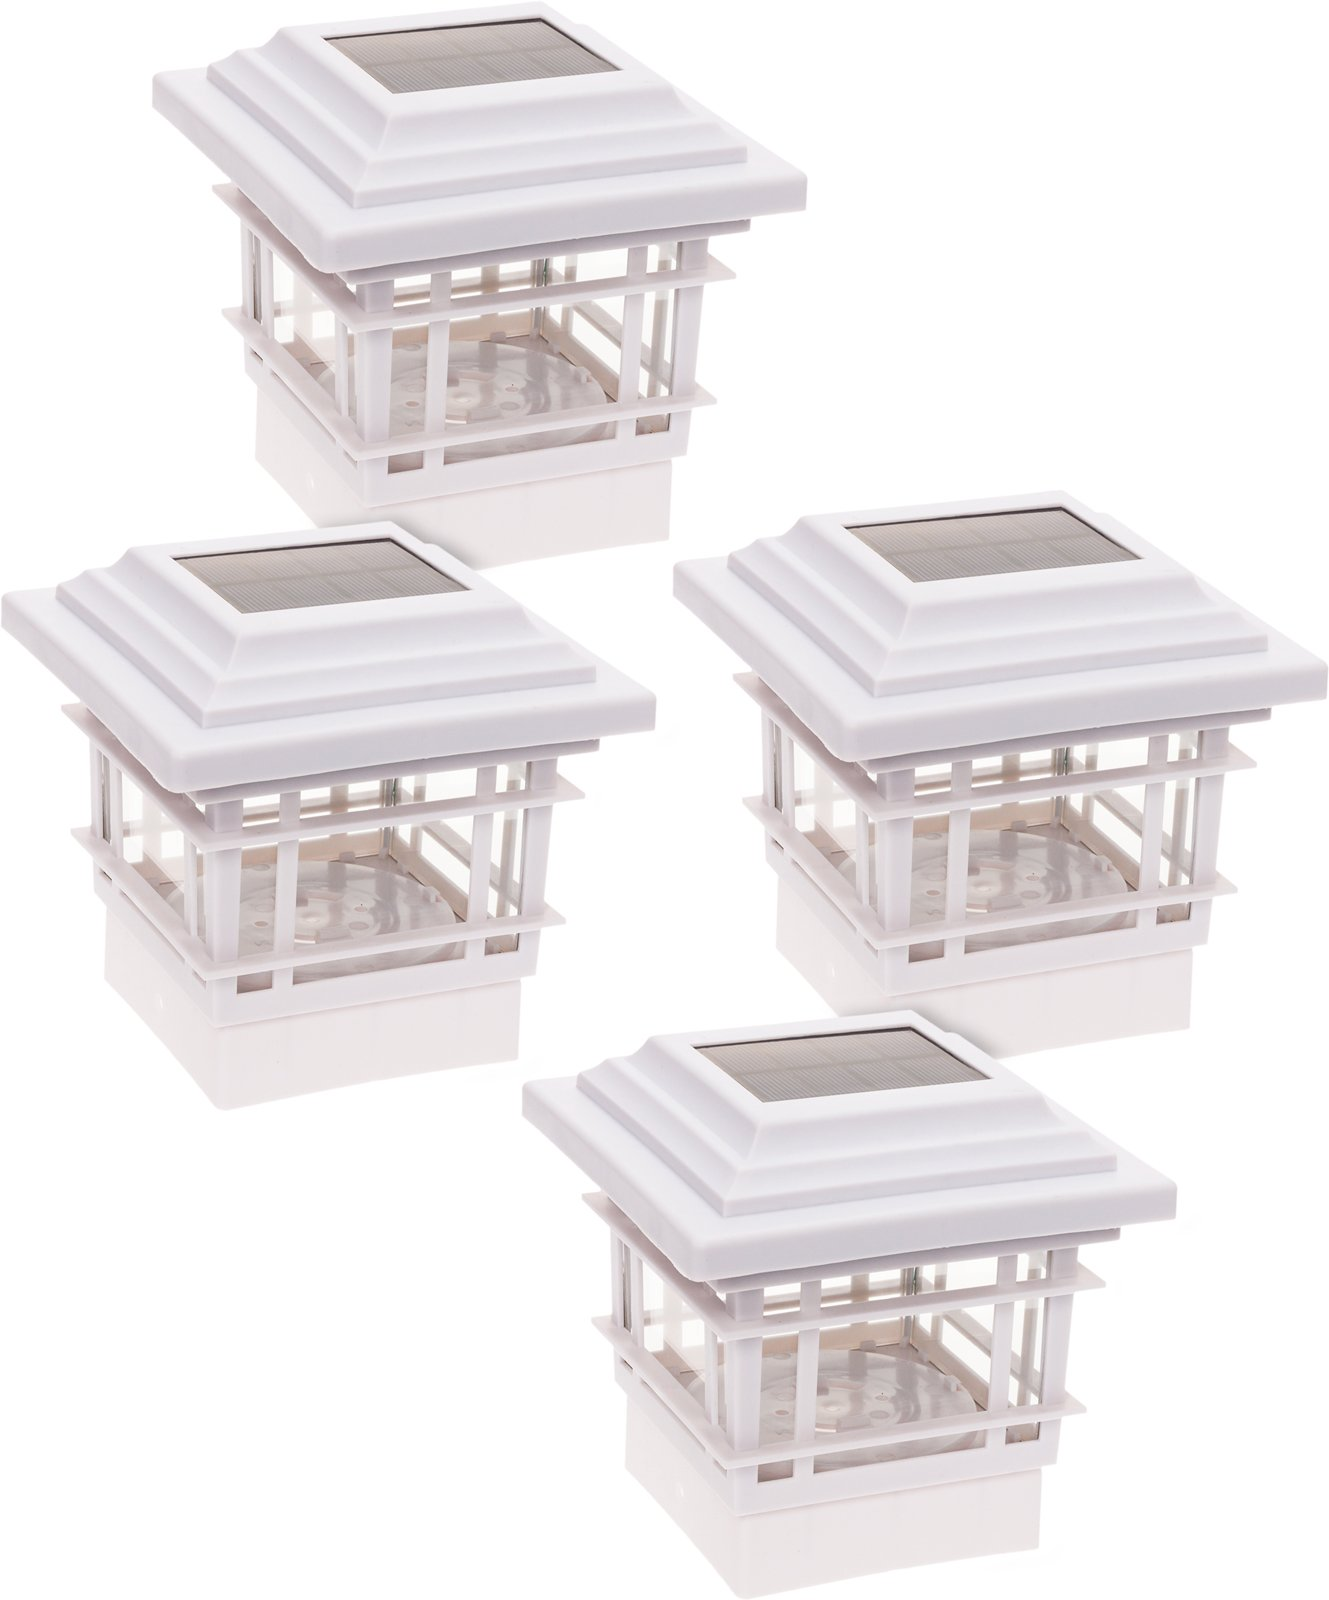 GreenLighting 4 Pack Classica High Lumen Plastic Solar Post Cap Lights for 4x4 Wood Posts (White)